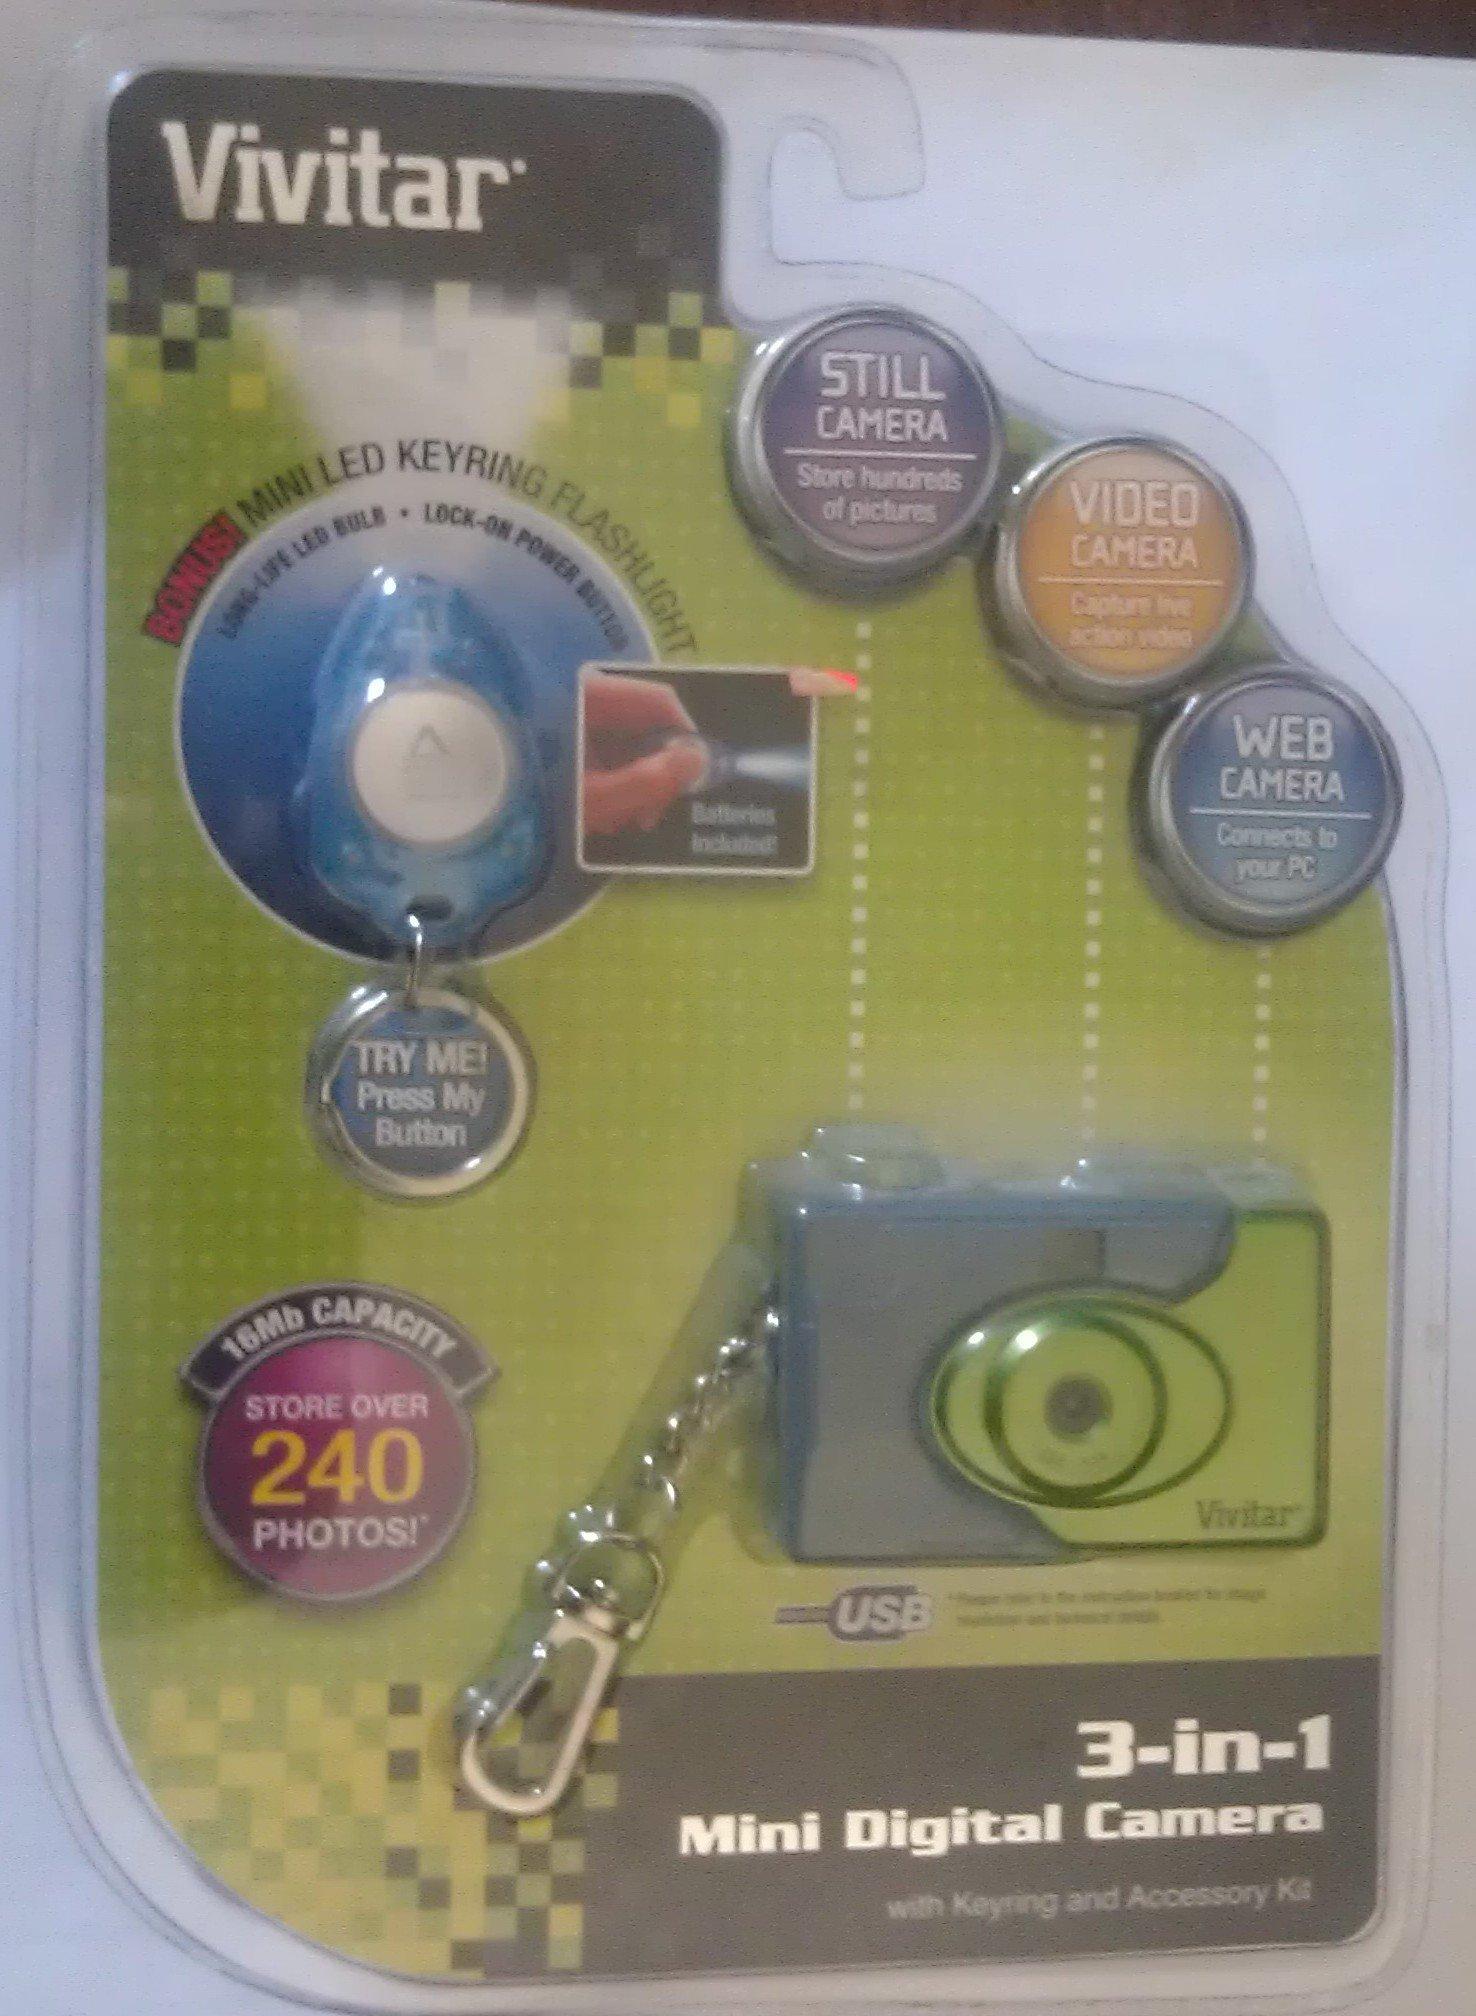 Vivitar 3-in-1 Mini Digital Camera with Flashlight - Blue